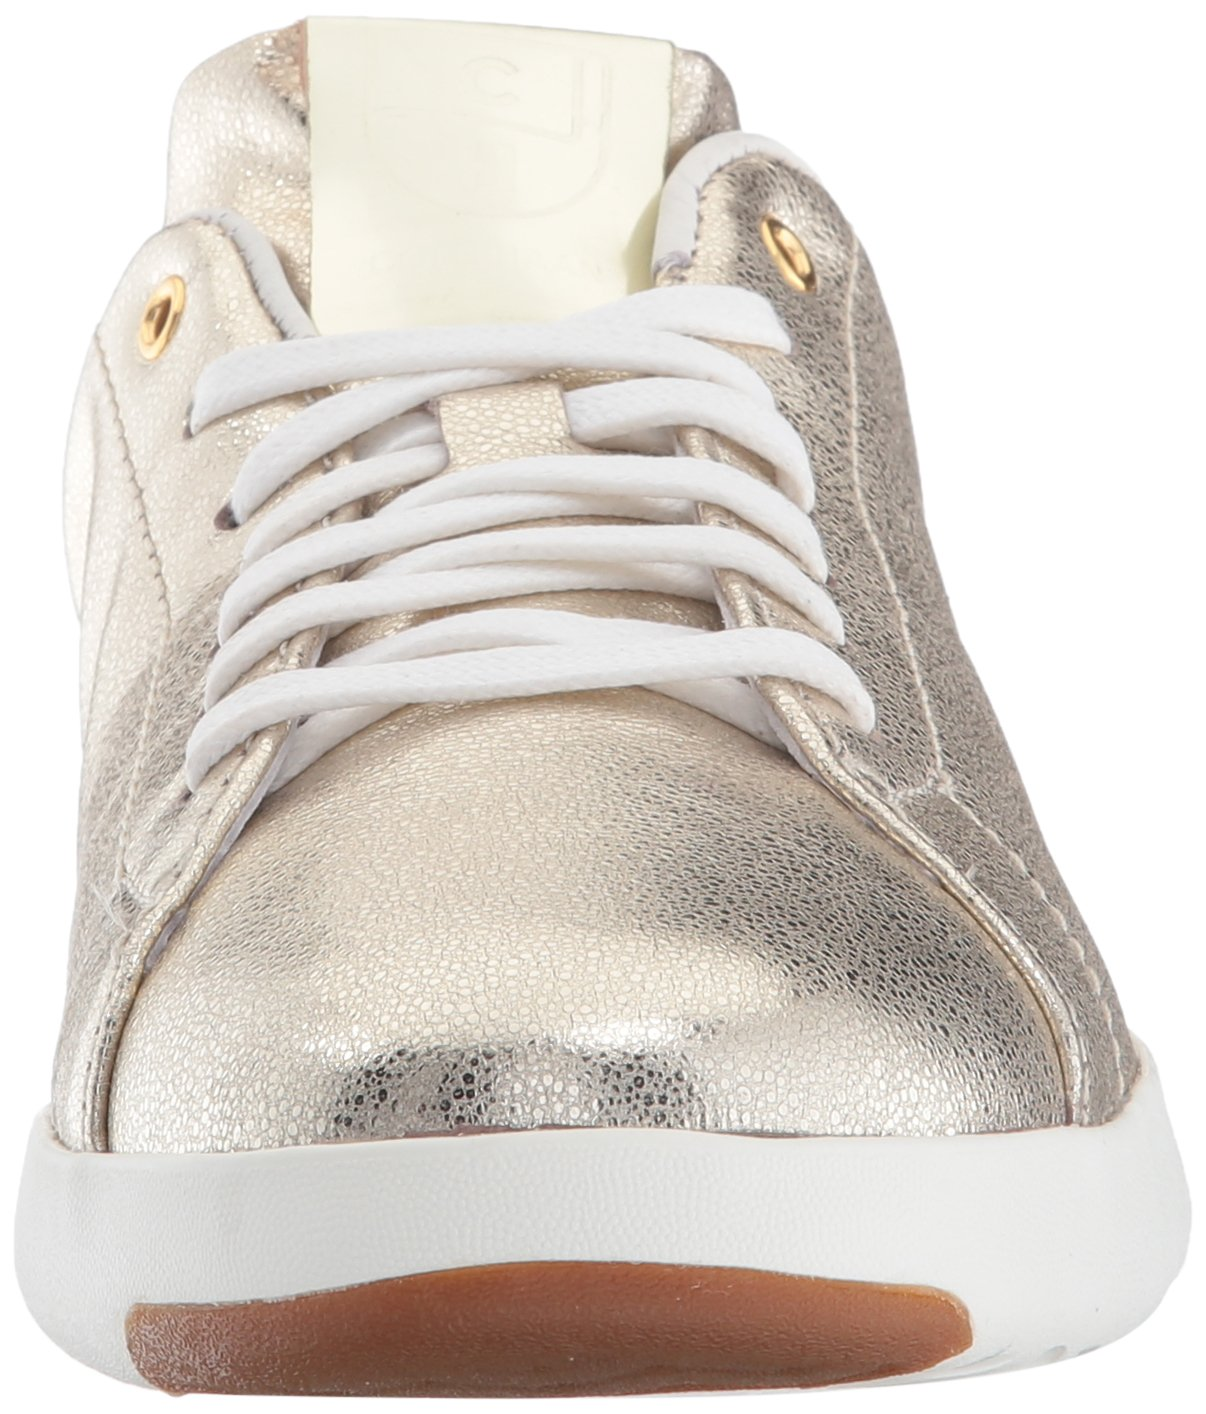 Cole Haan Women's Grandpro Tennis Leather Lace OX Fashion Sneaker B06ZYLL11L 6.5 B(M) US Platino Glitter